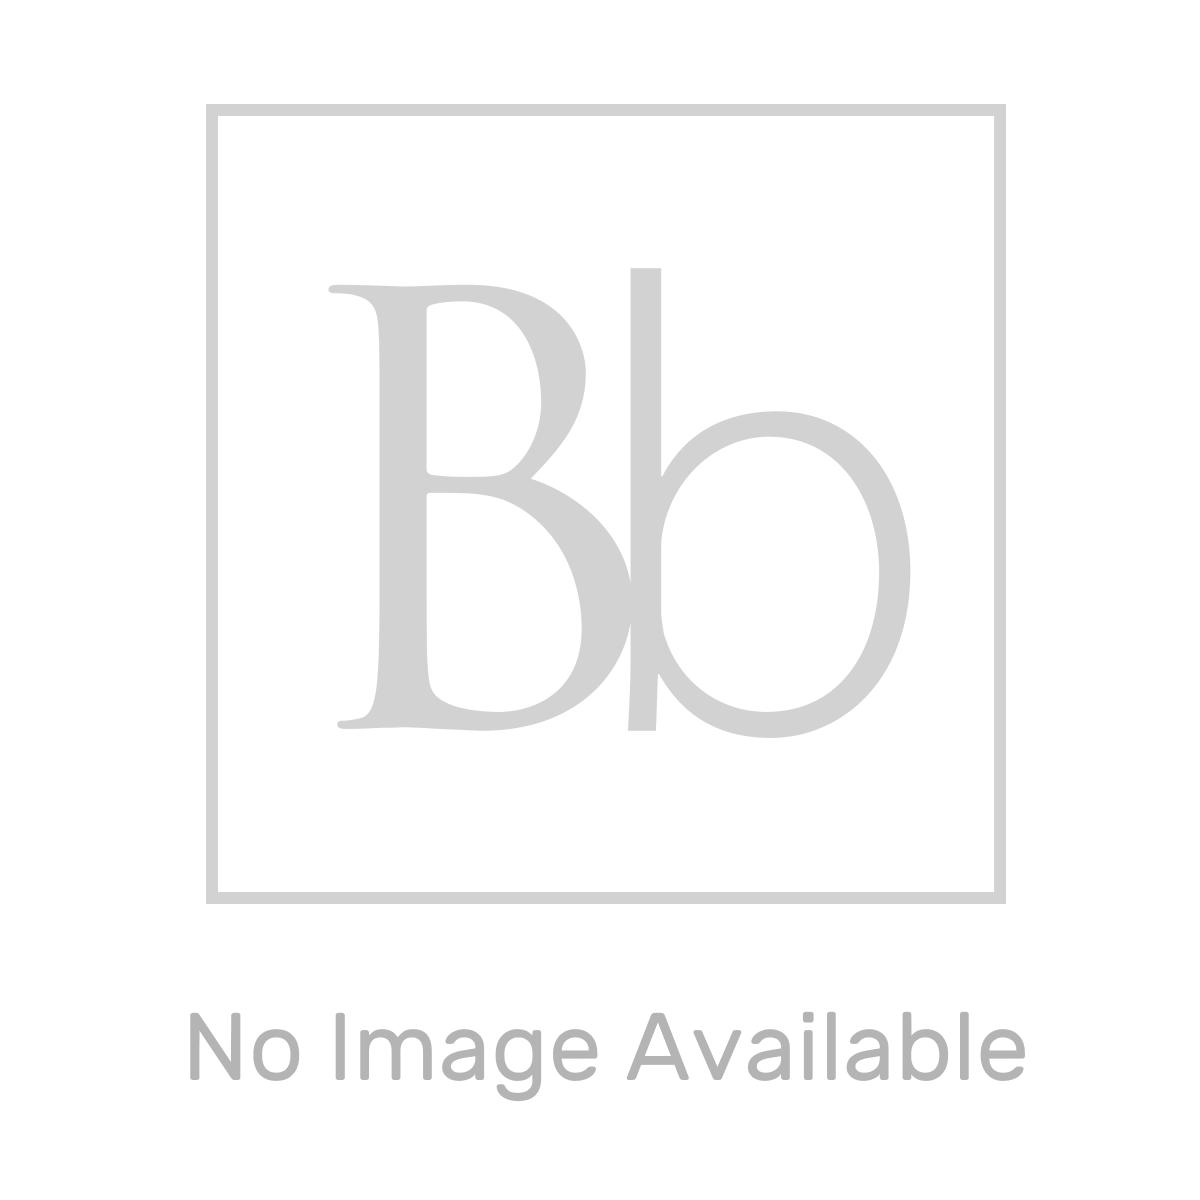 Premier High Gloss White Storage Cupboard Dimensions